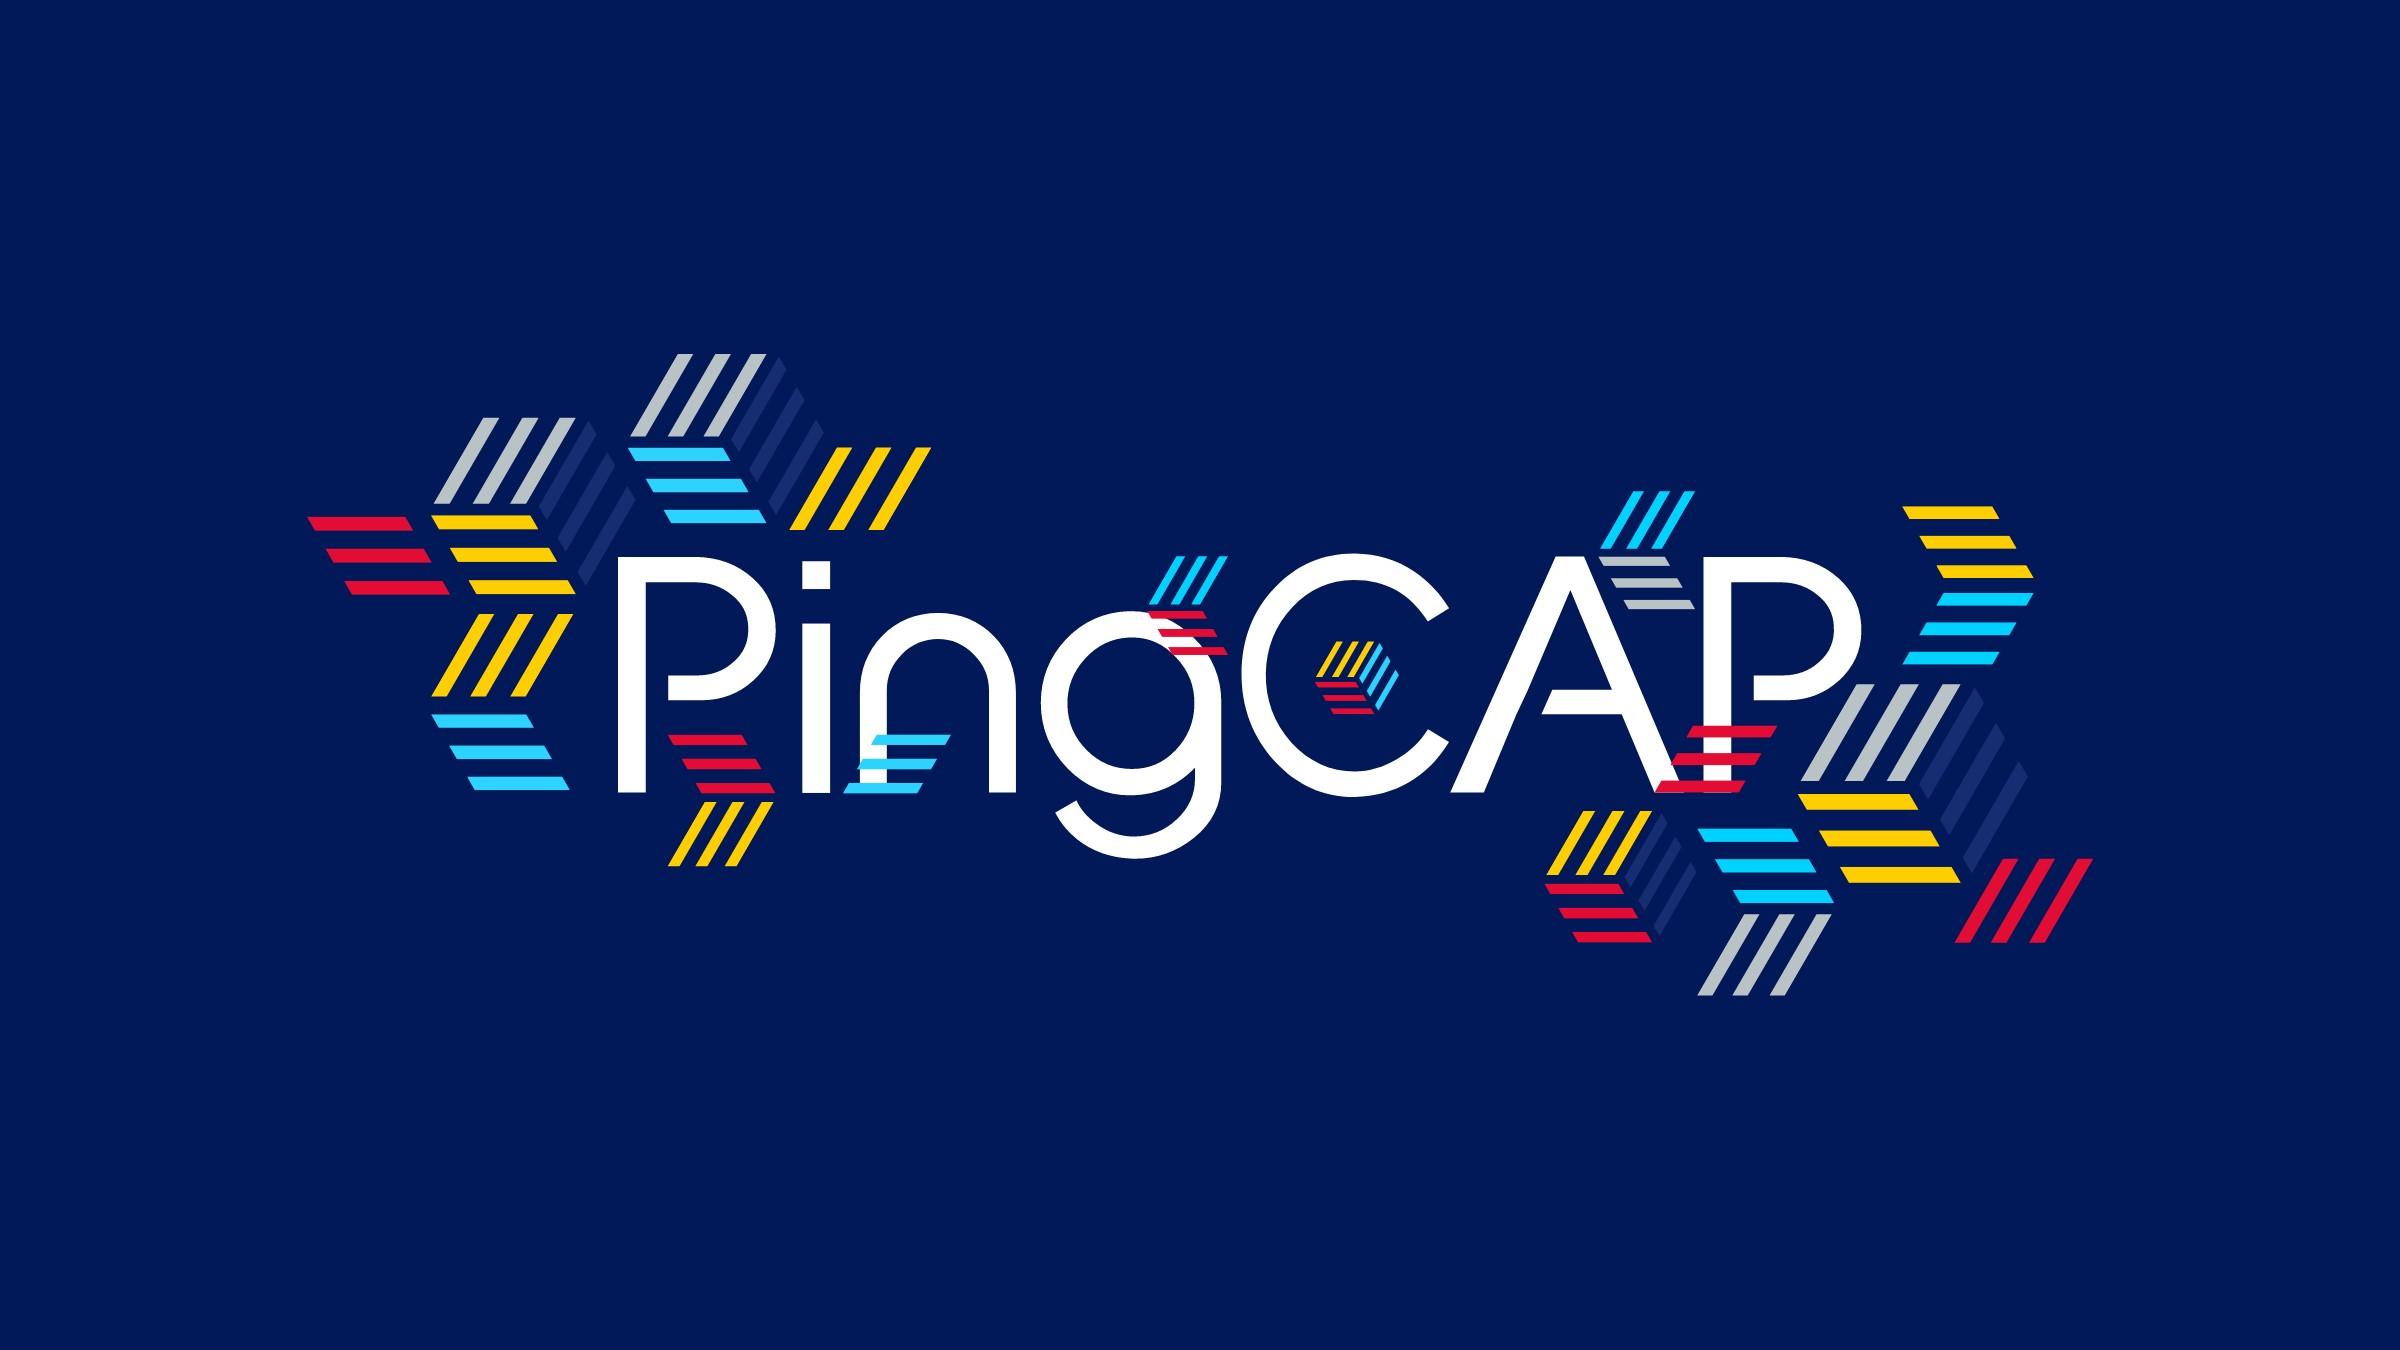 【ToB快讯】PingCAP完成D轮 2.7 亿美元融资,创造全球数据库历史新的里程碑